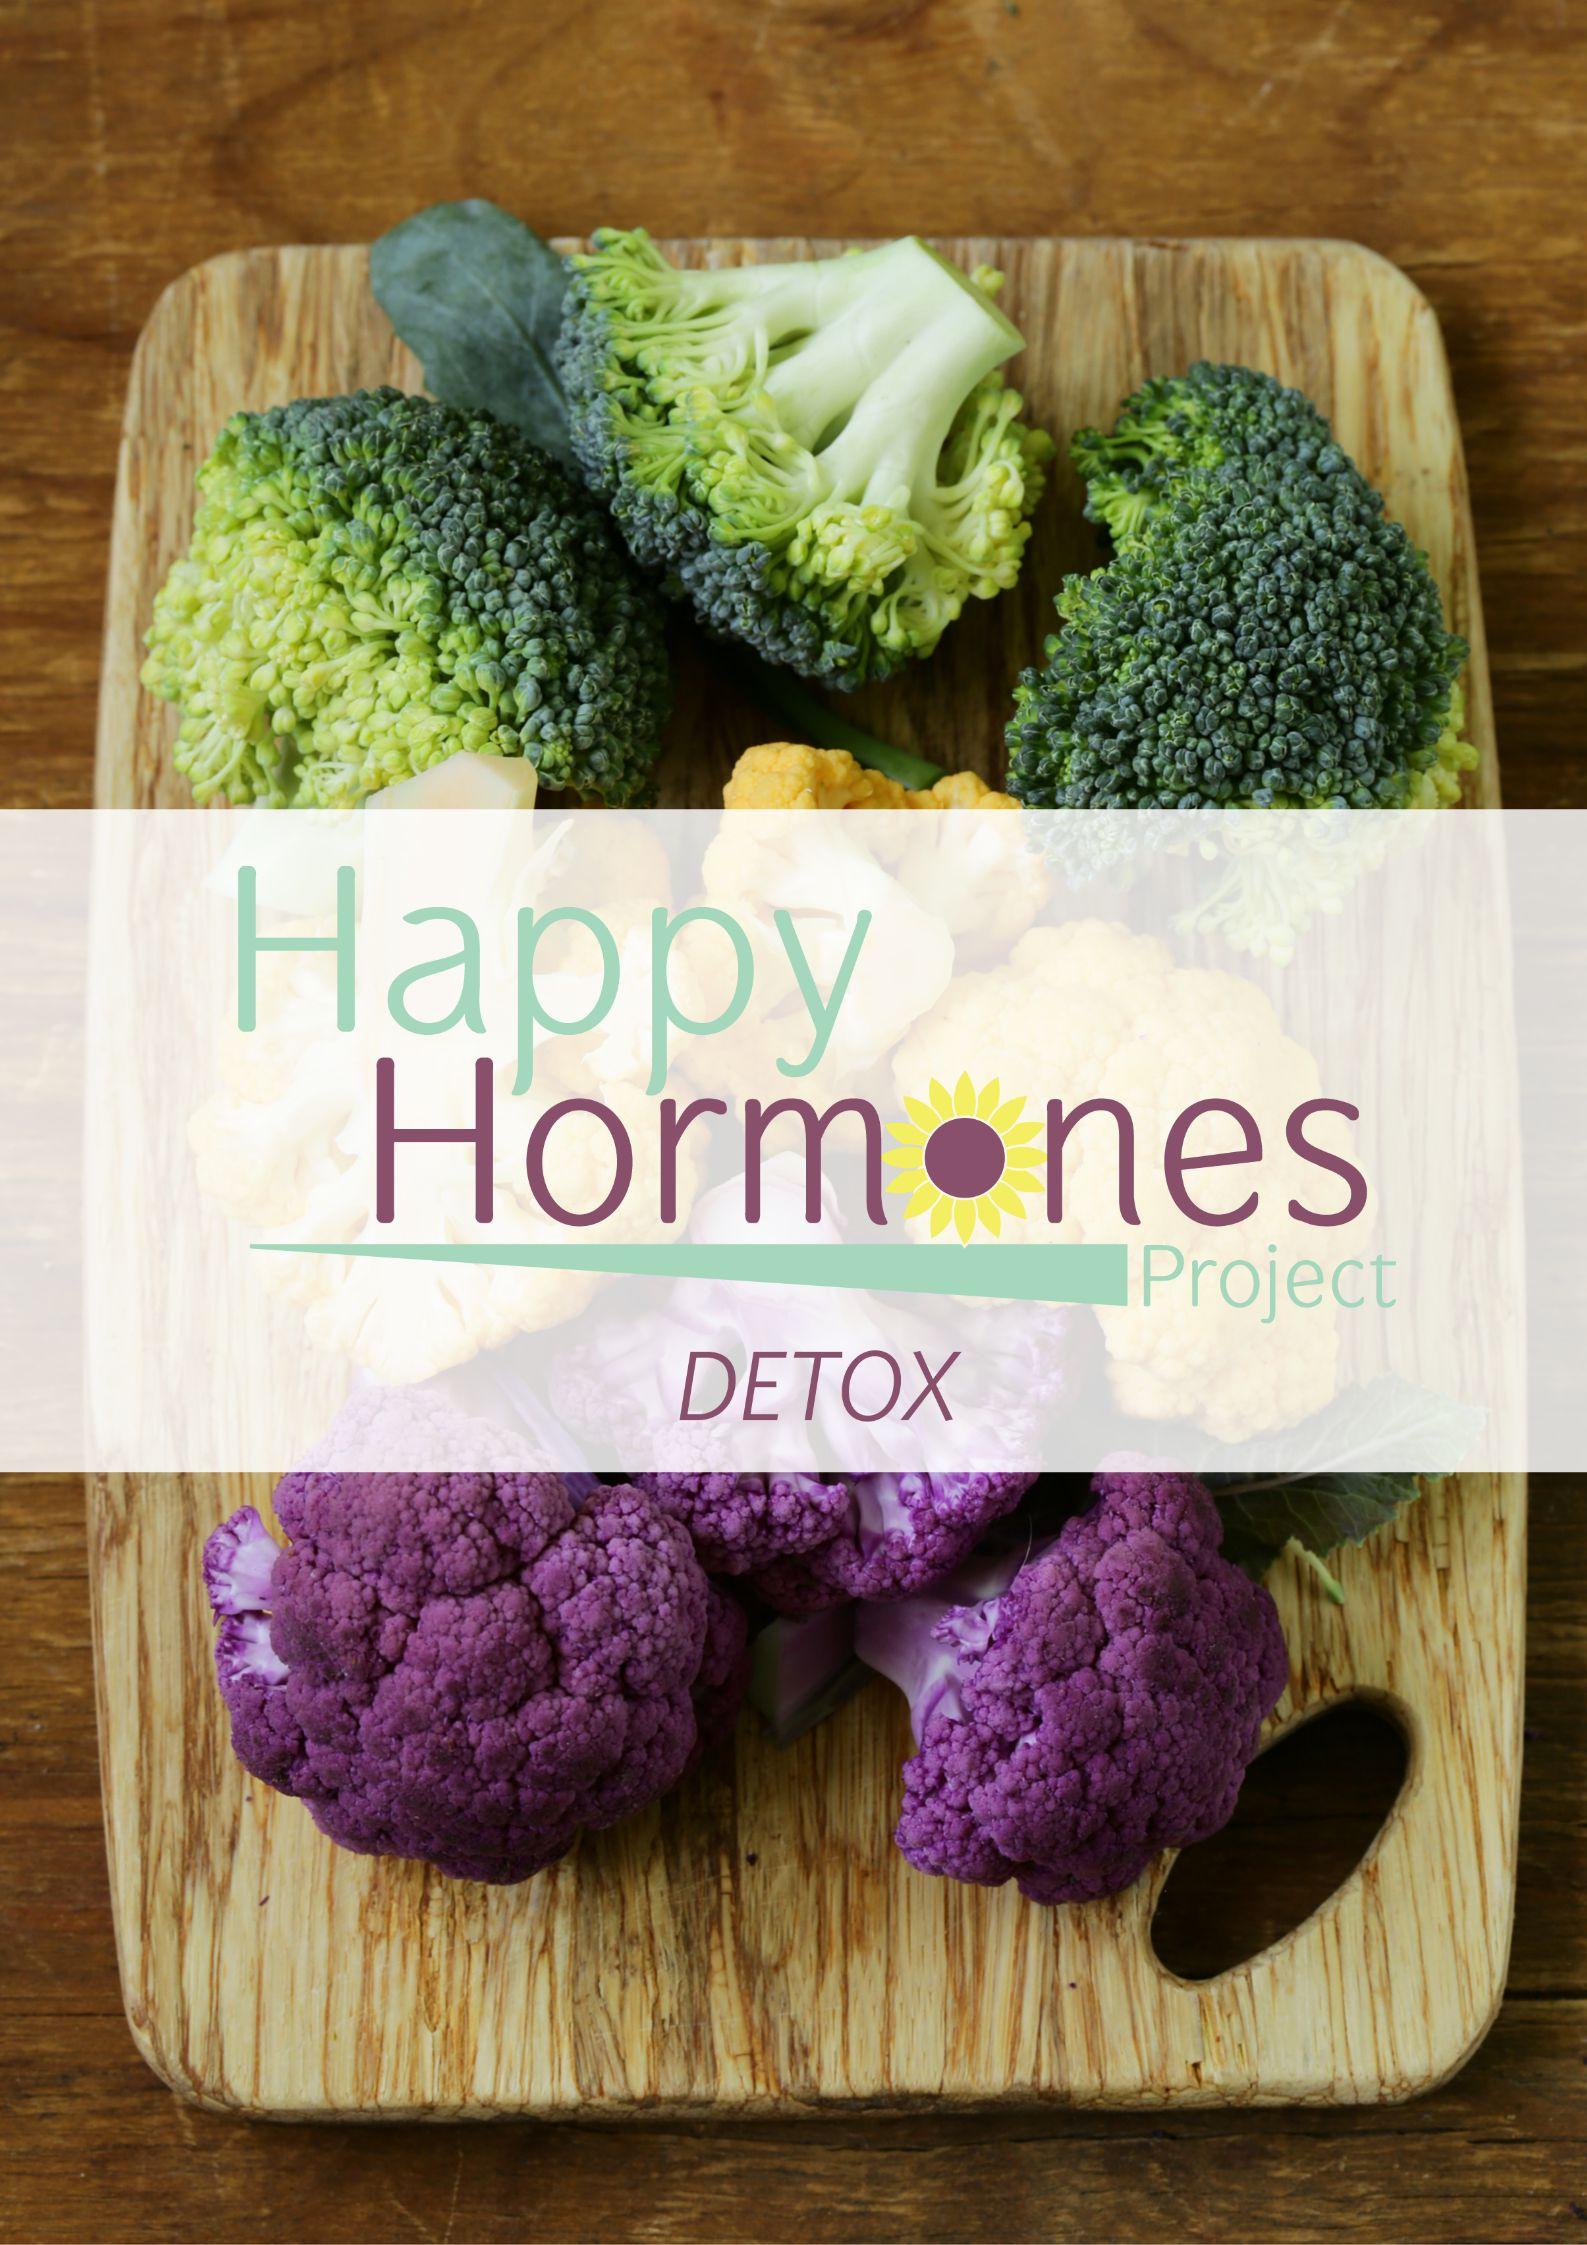 happy hormones detox landing page poster graphic